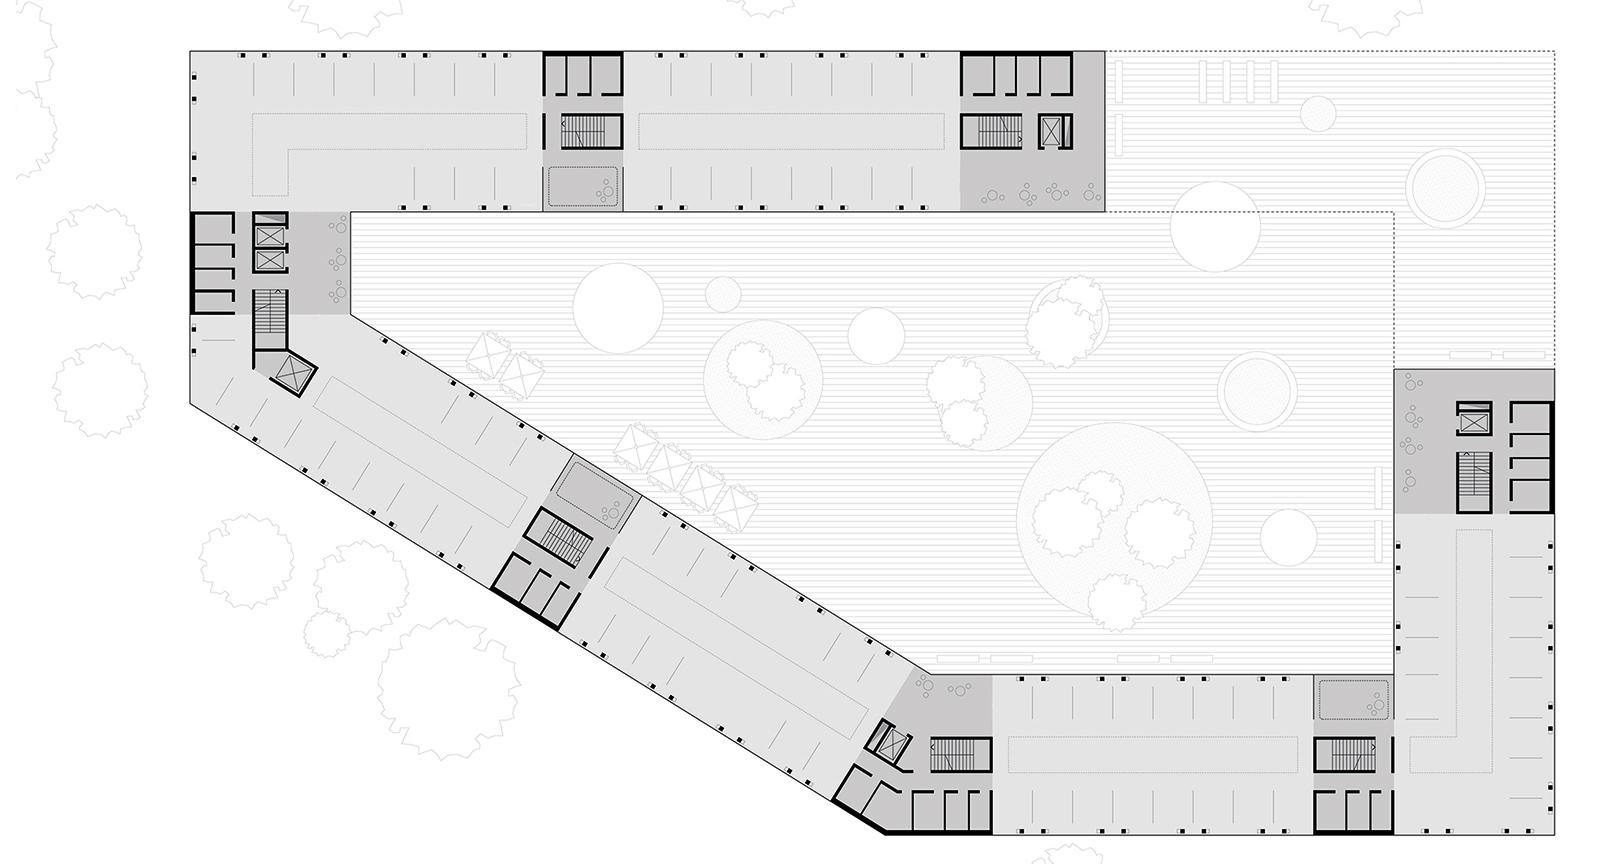 plan_1OG_WBA_SEHW SEHW Architektur GmbH}